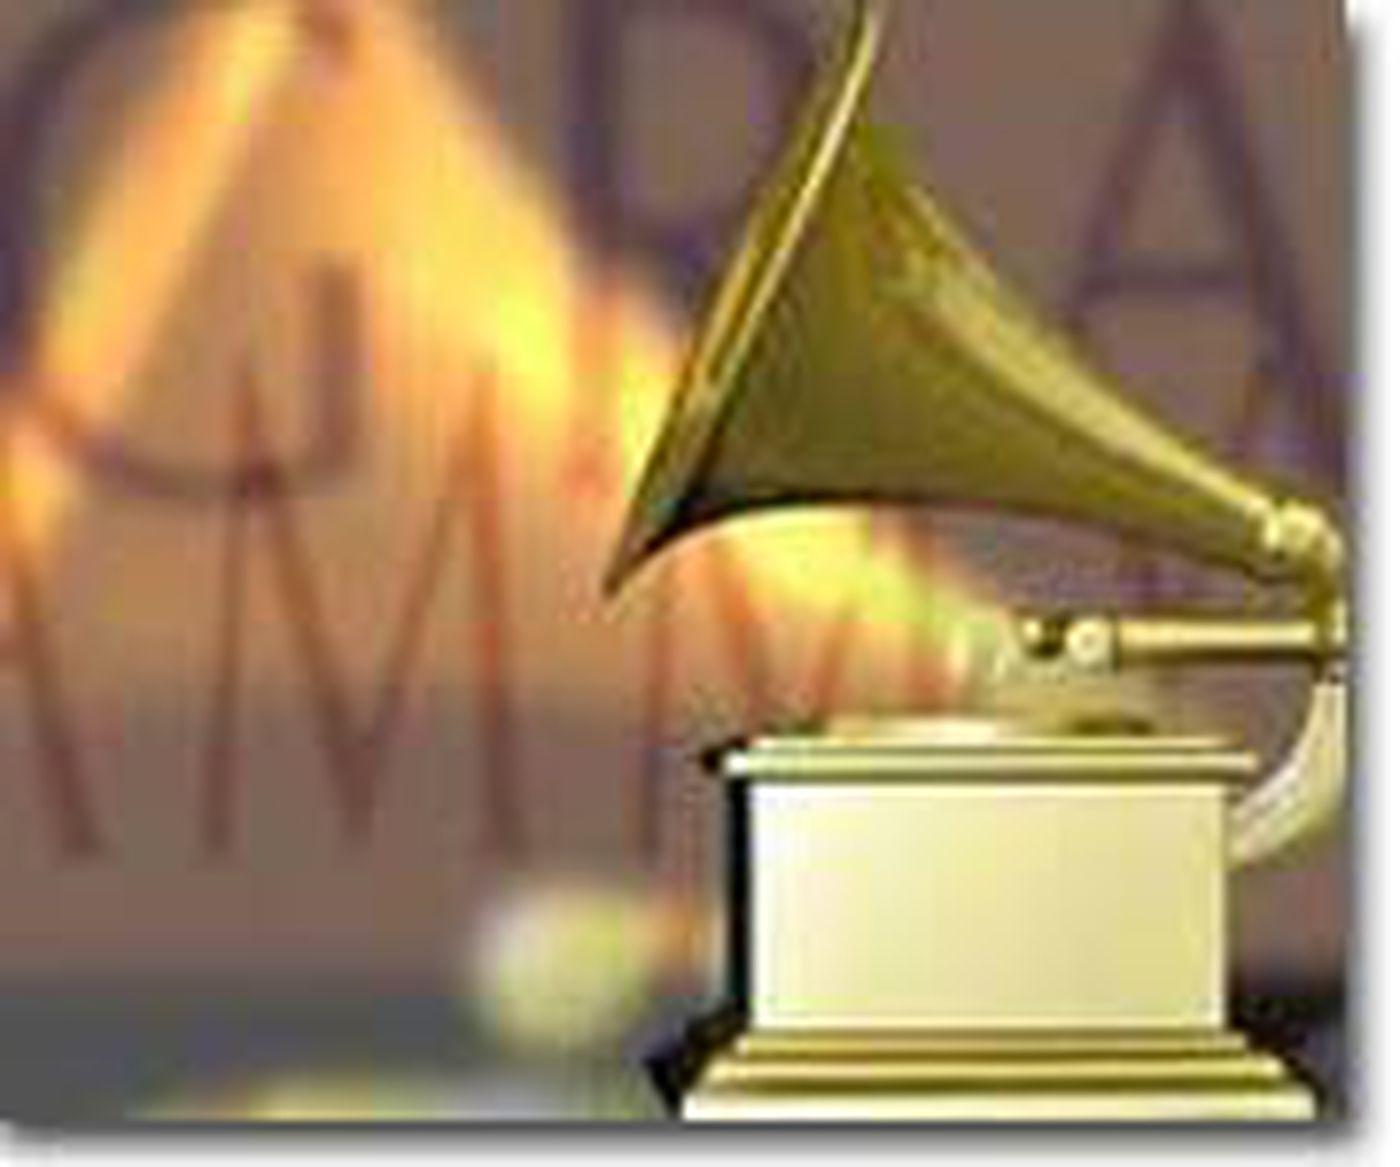 2007 Grammy Awards, Tonight at 7pm